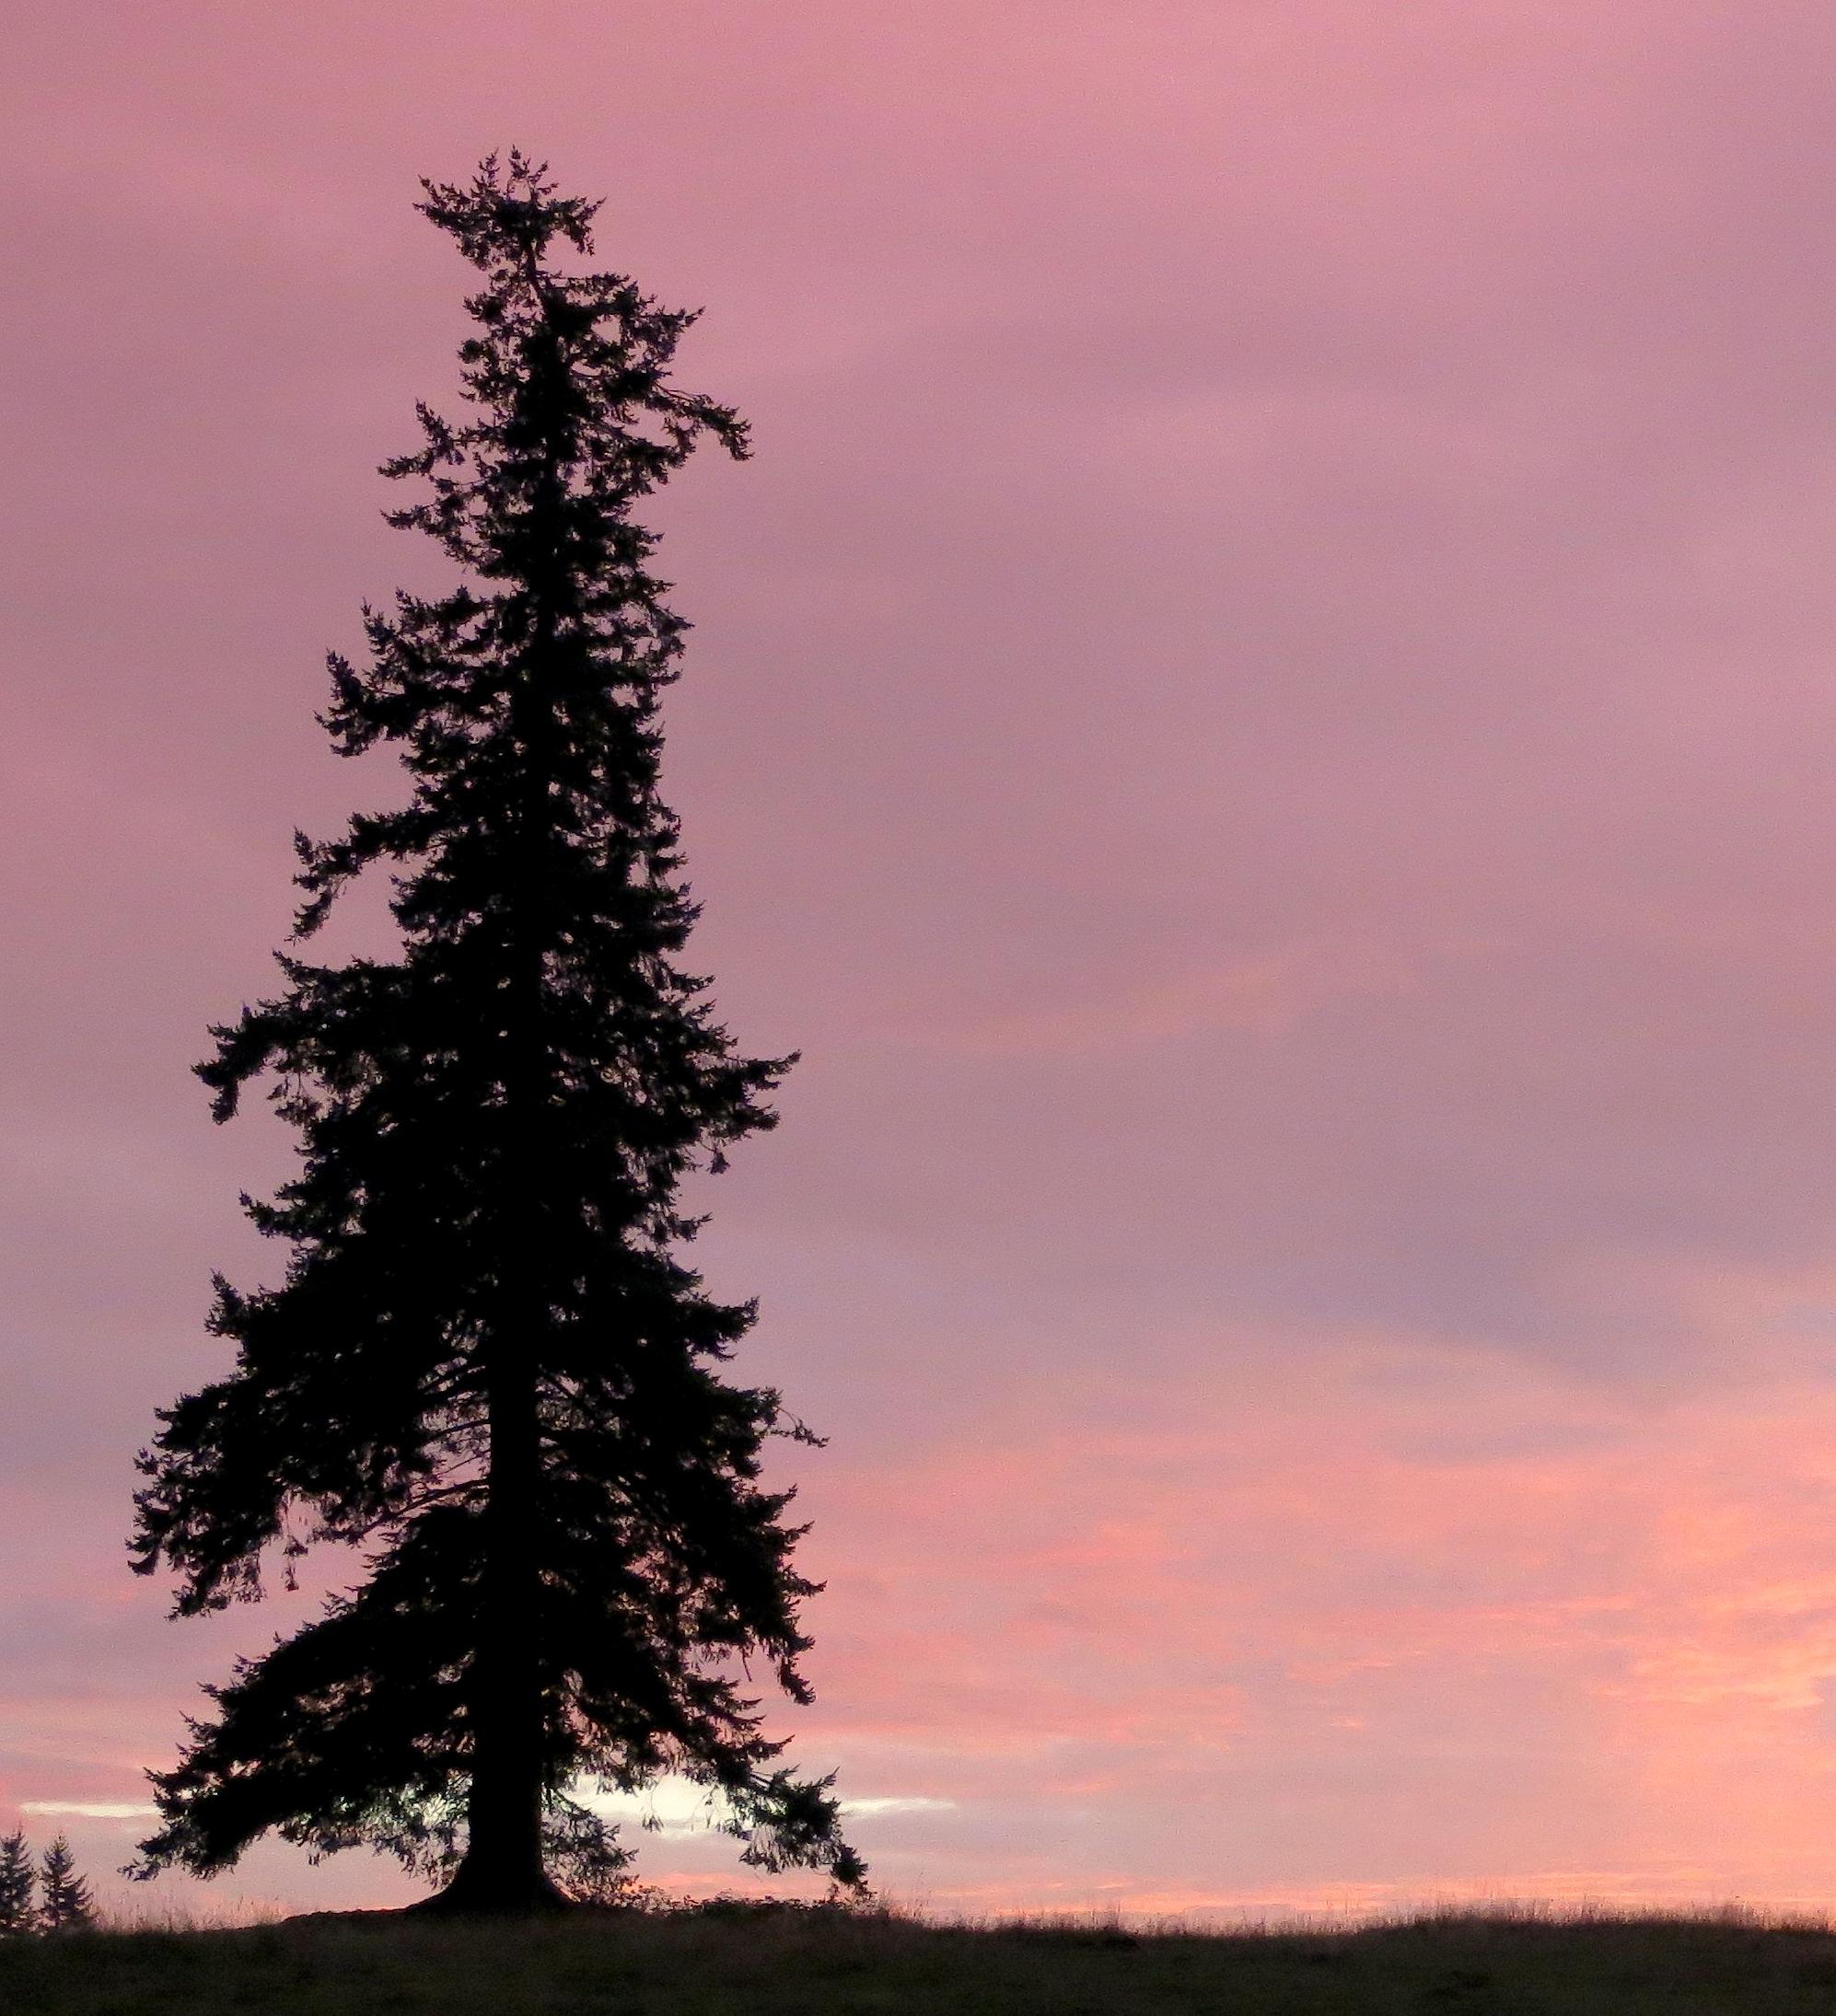 sunset964